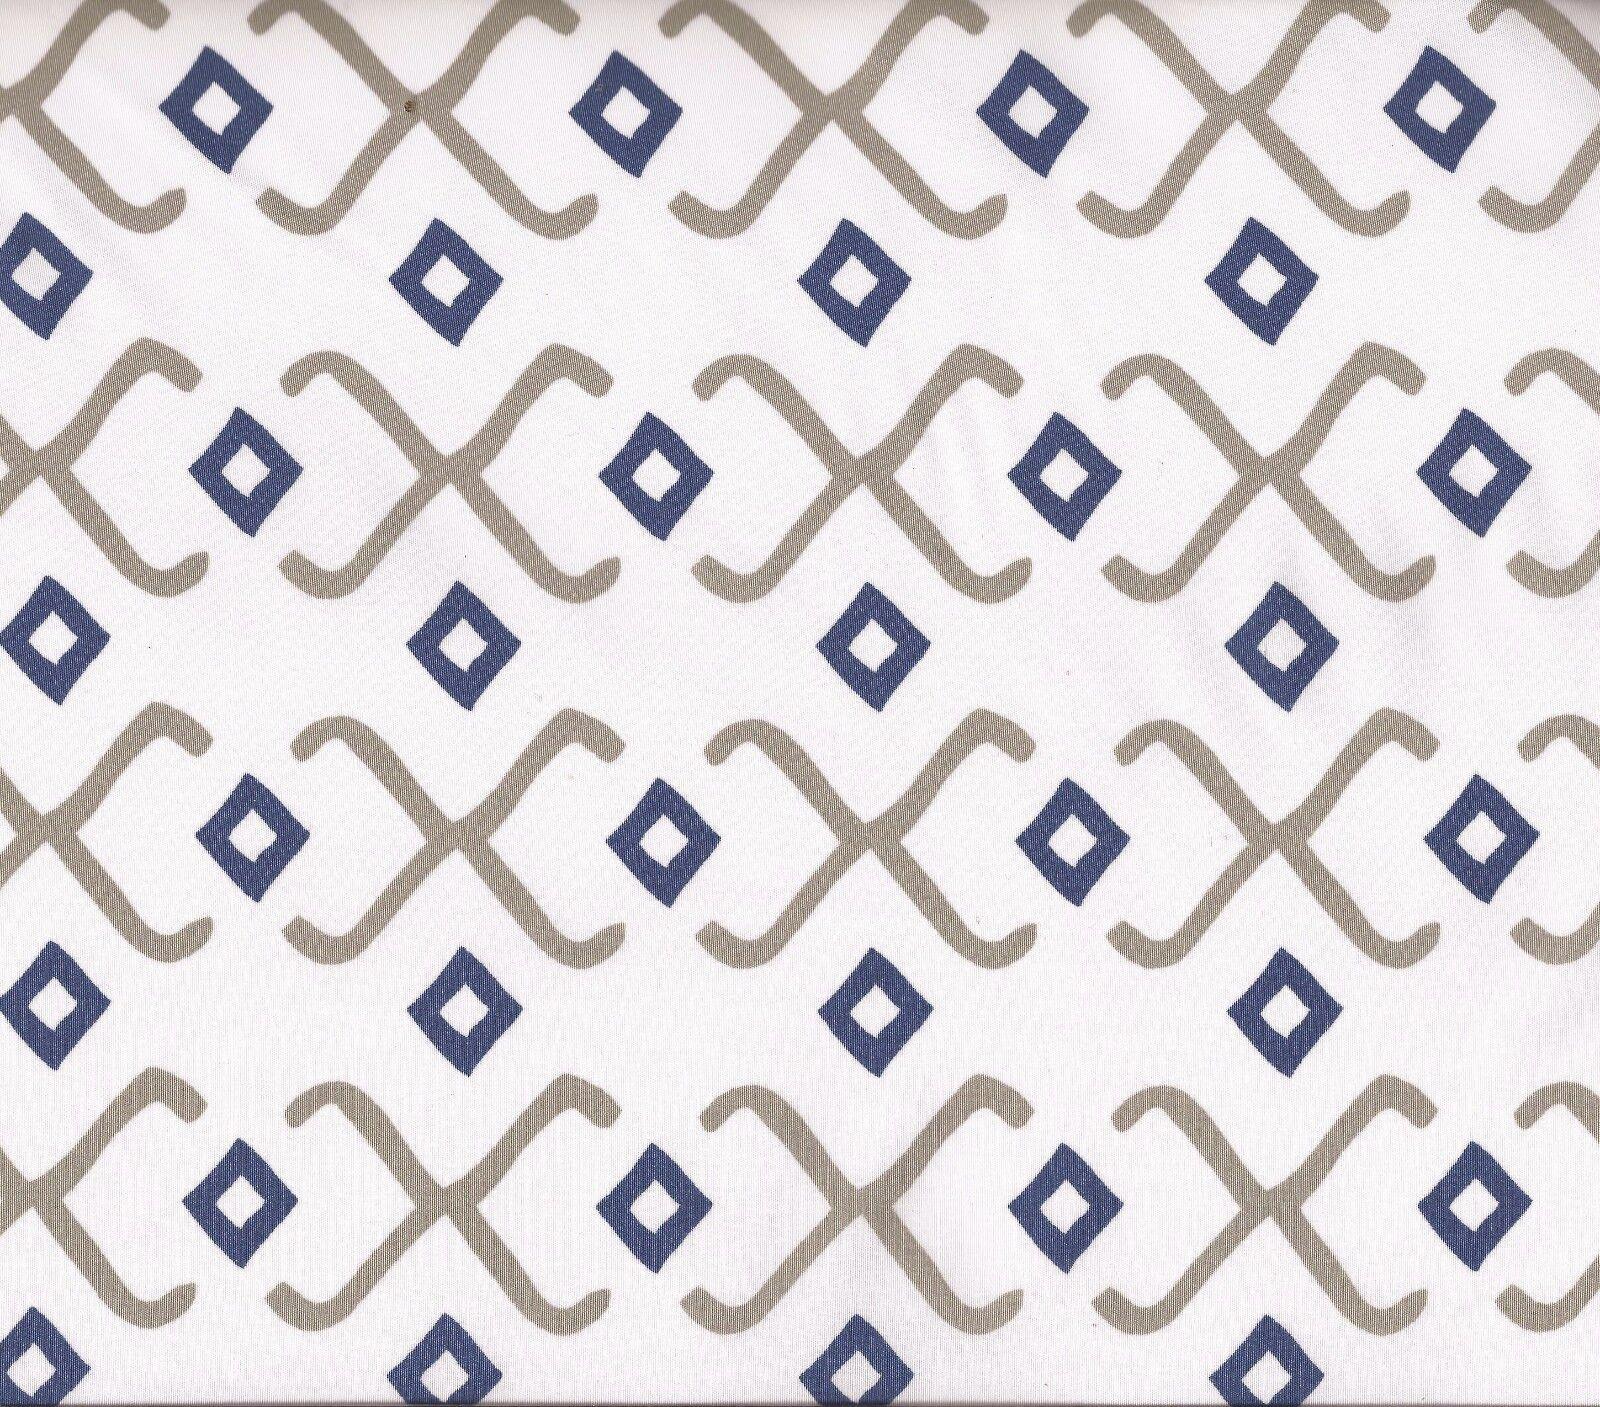 "Blue White Gray Body Pillow Cover Case for 20"" X 52""  Pi"